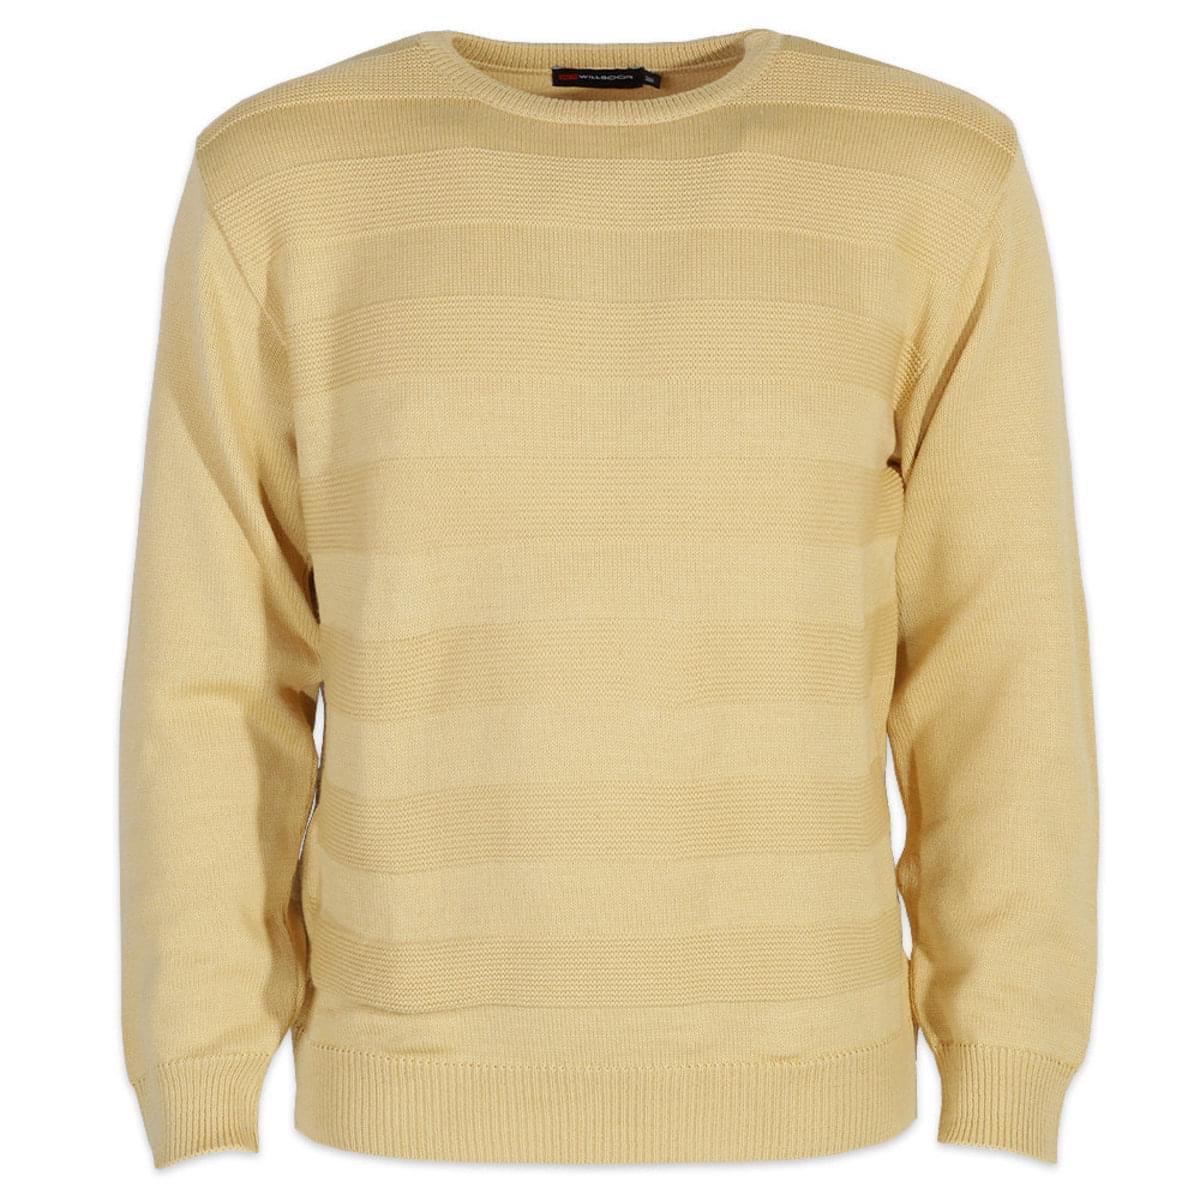 Pánský svetr Salvador 6487 ve žluté barvě XXL